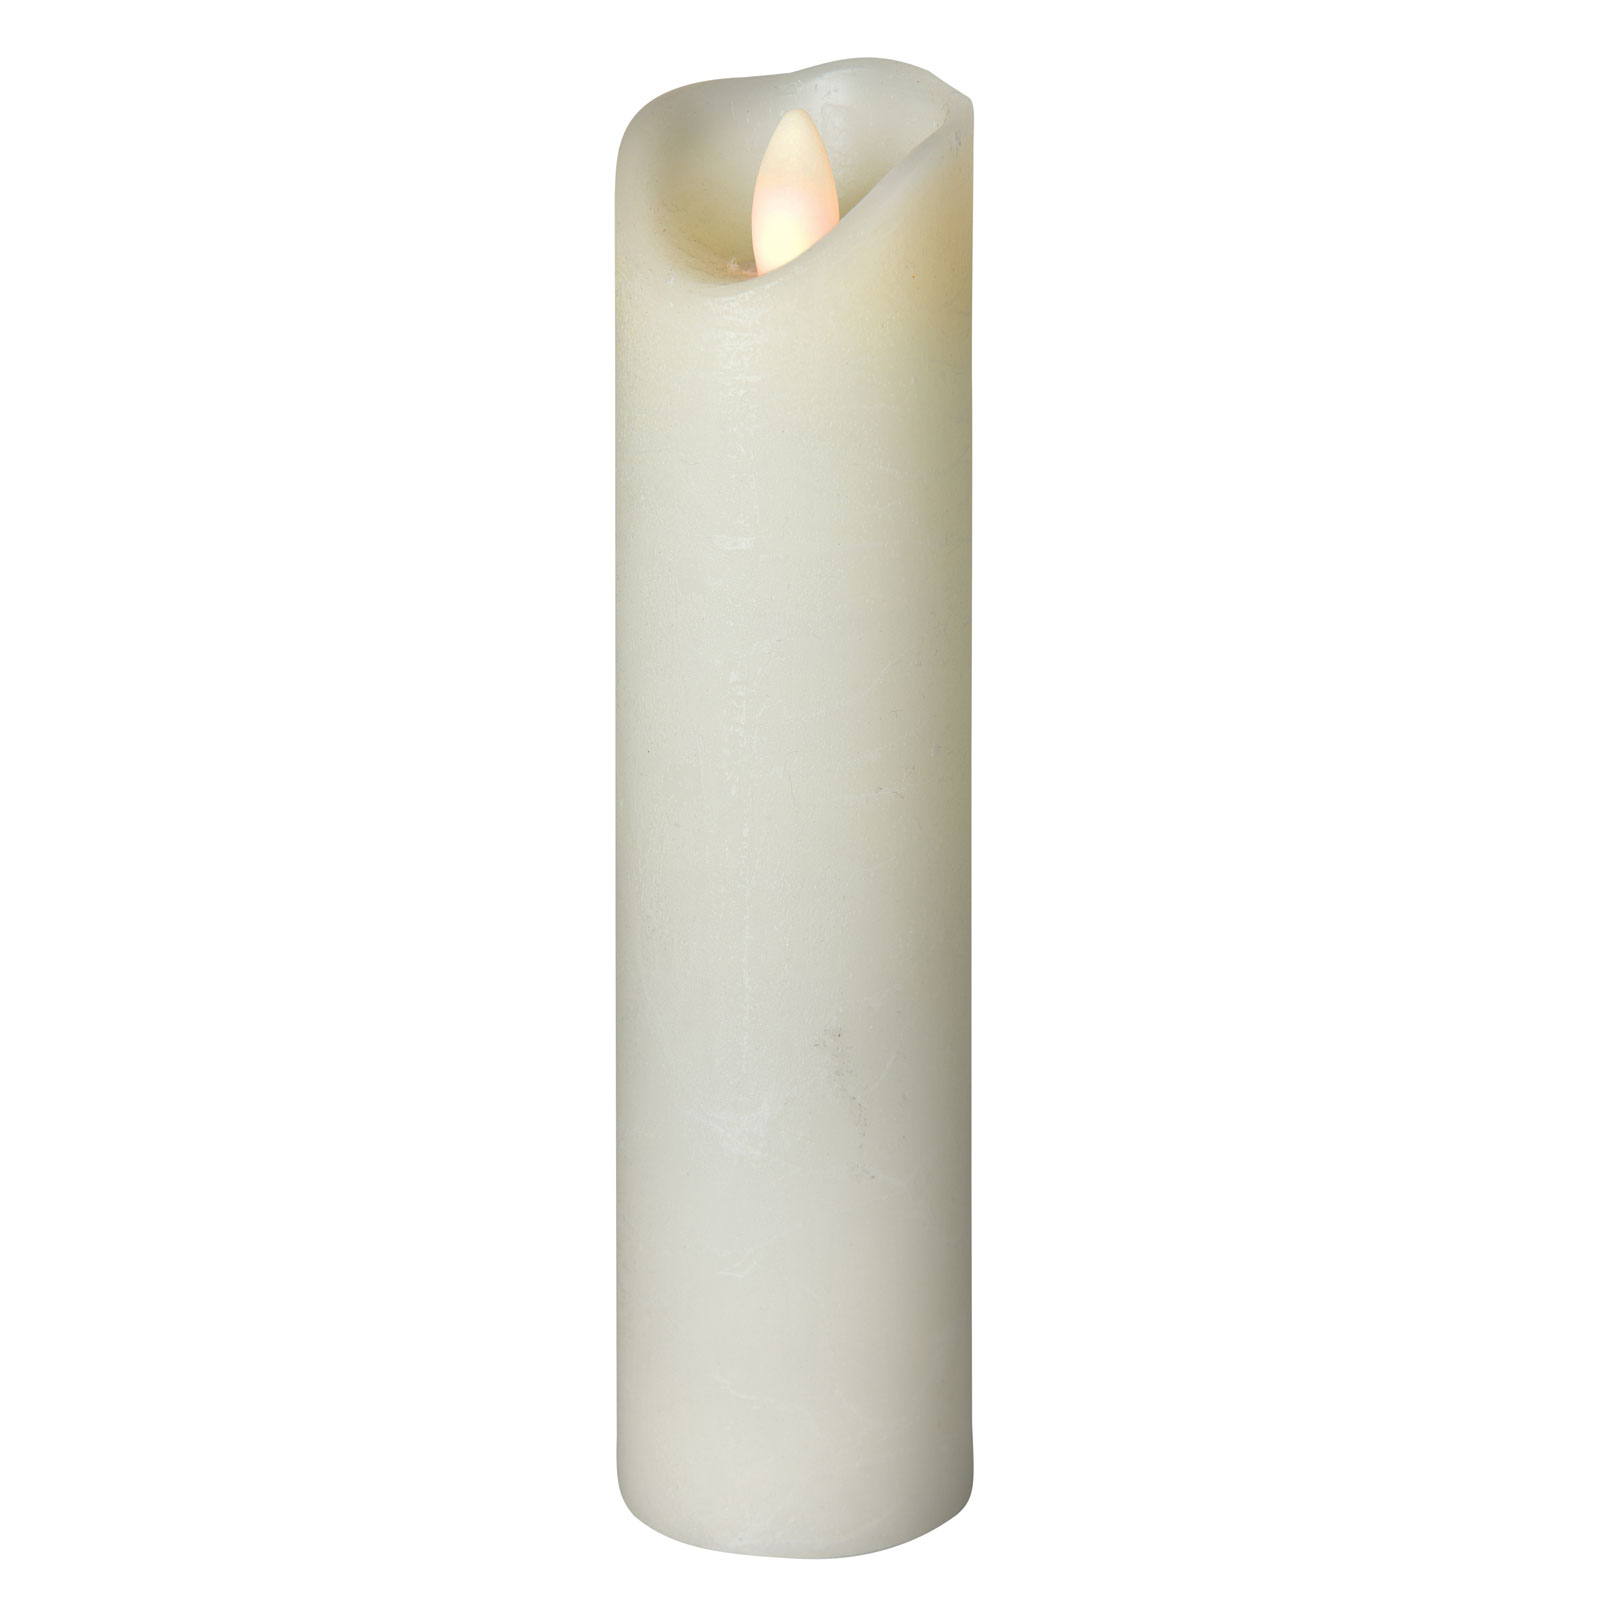 LED-Kerze Shine, Ø 5 cm, elfenbein, Höhe 20 cm